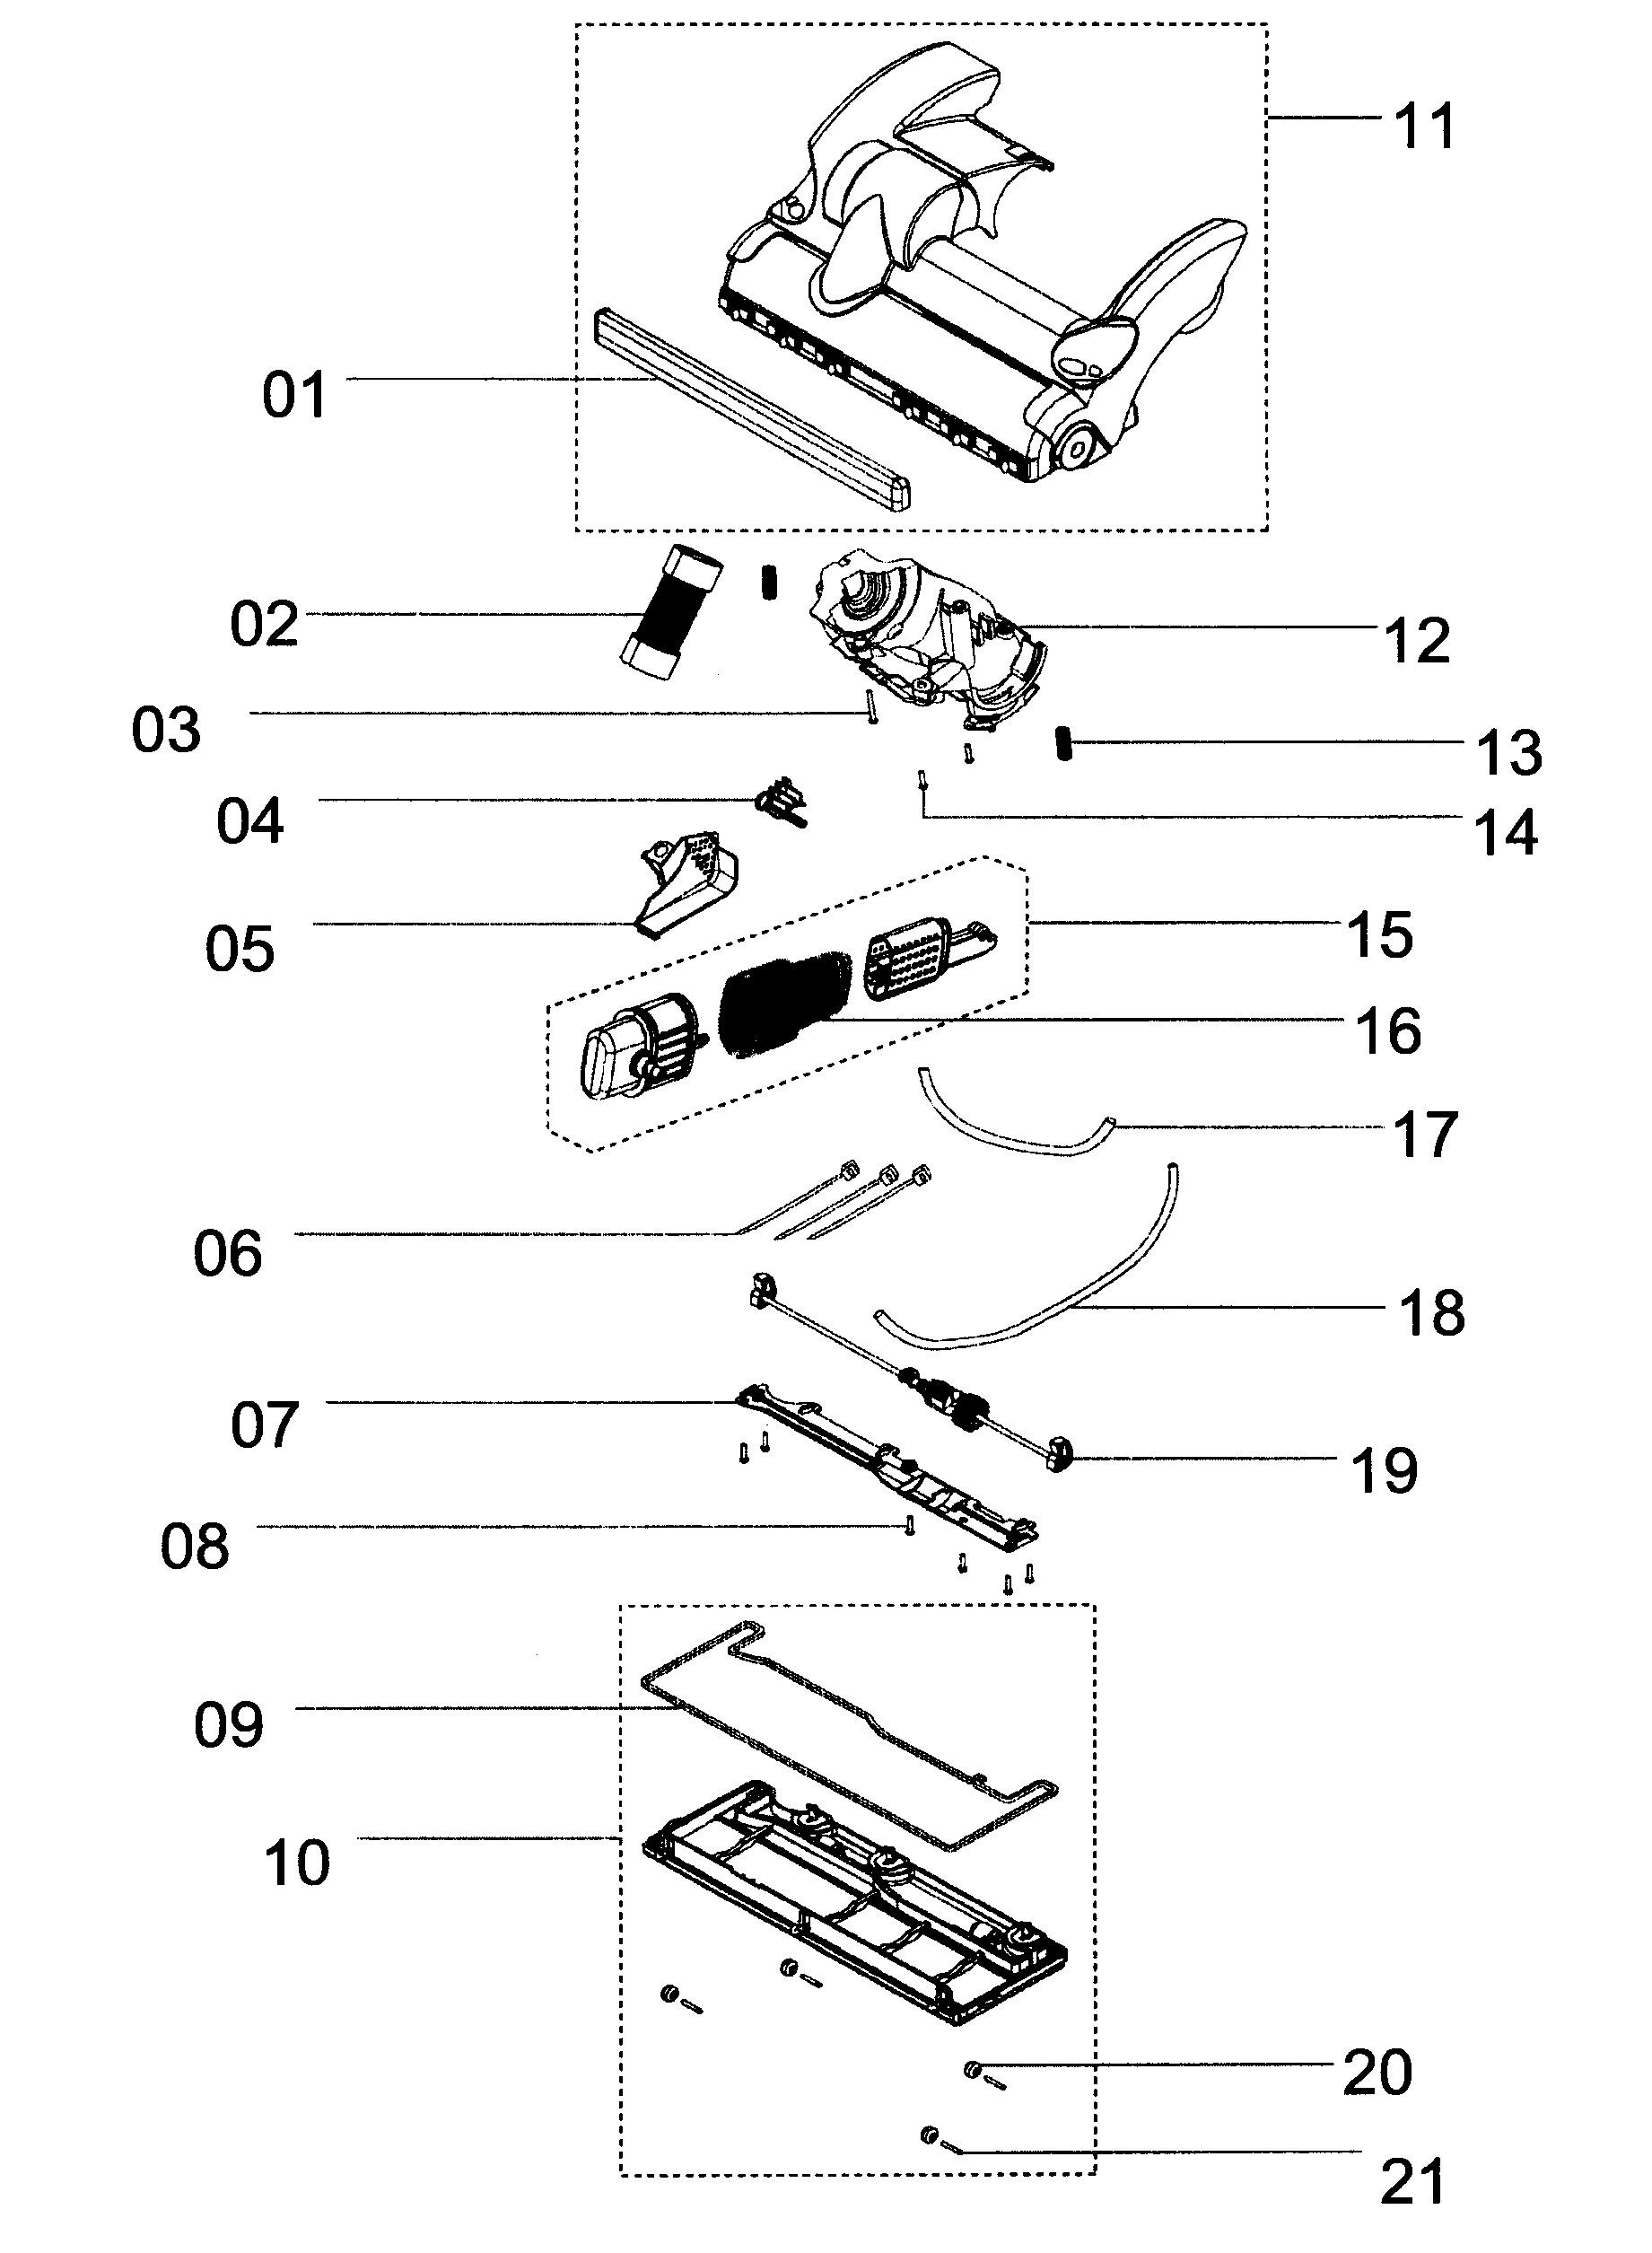 Dyson Dc15 Parts Diagram Dyson Dc33 Parts Diagram Rug